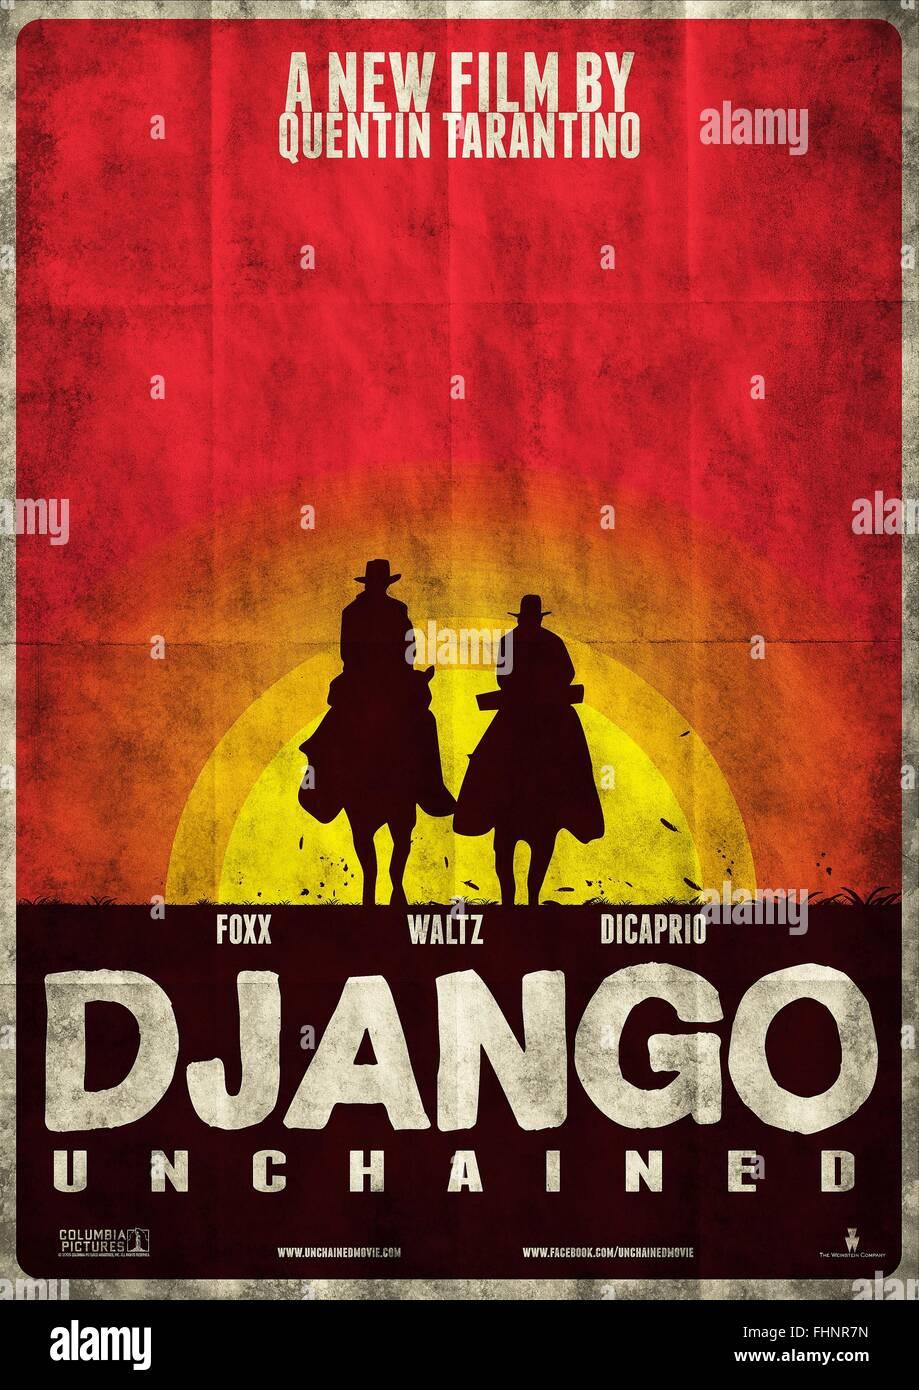 Movie Poster Django Unchained 2012 Stock Photo Alamy